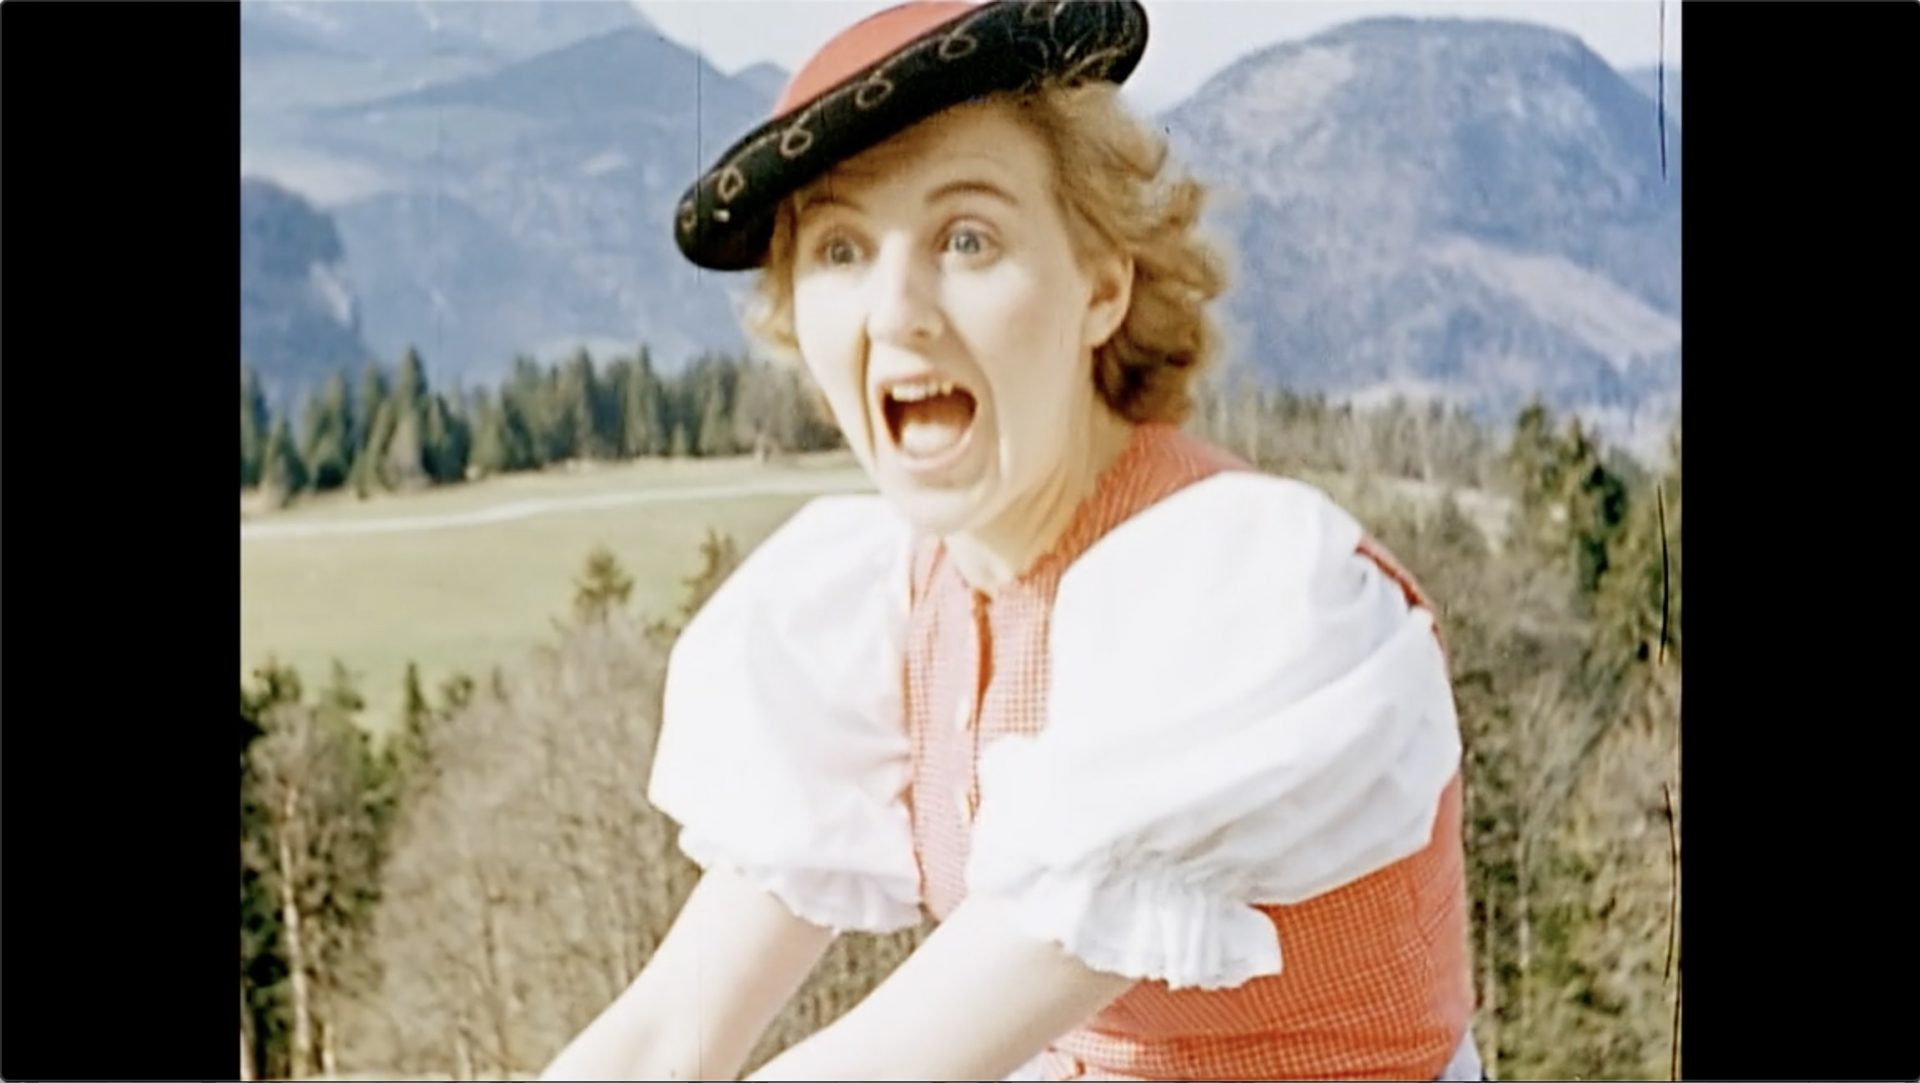 Eva Braun, Berchtesgaden